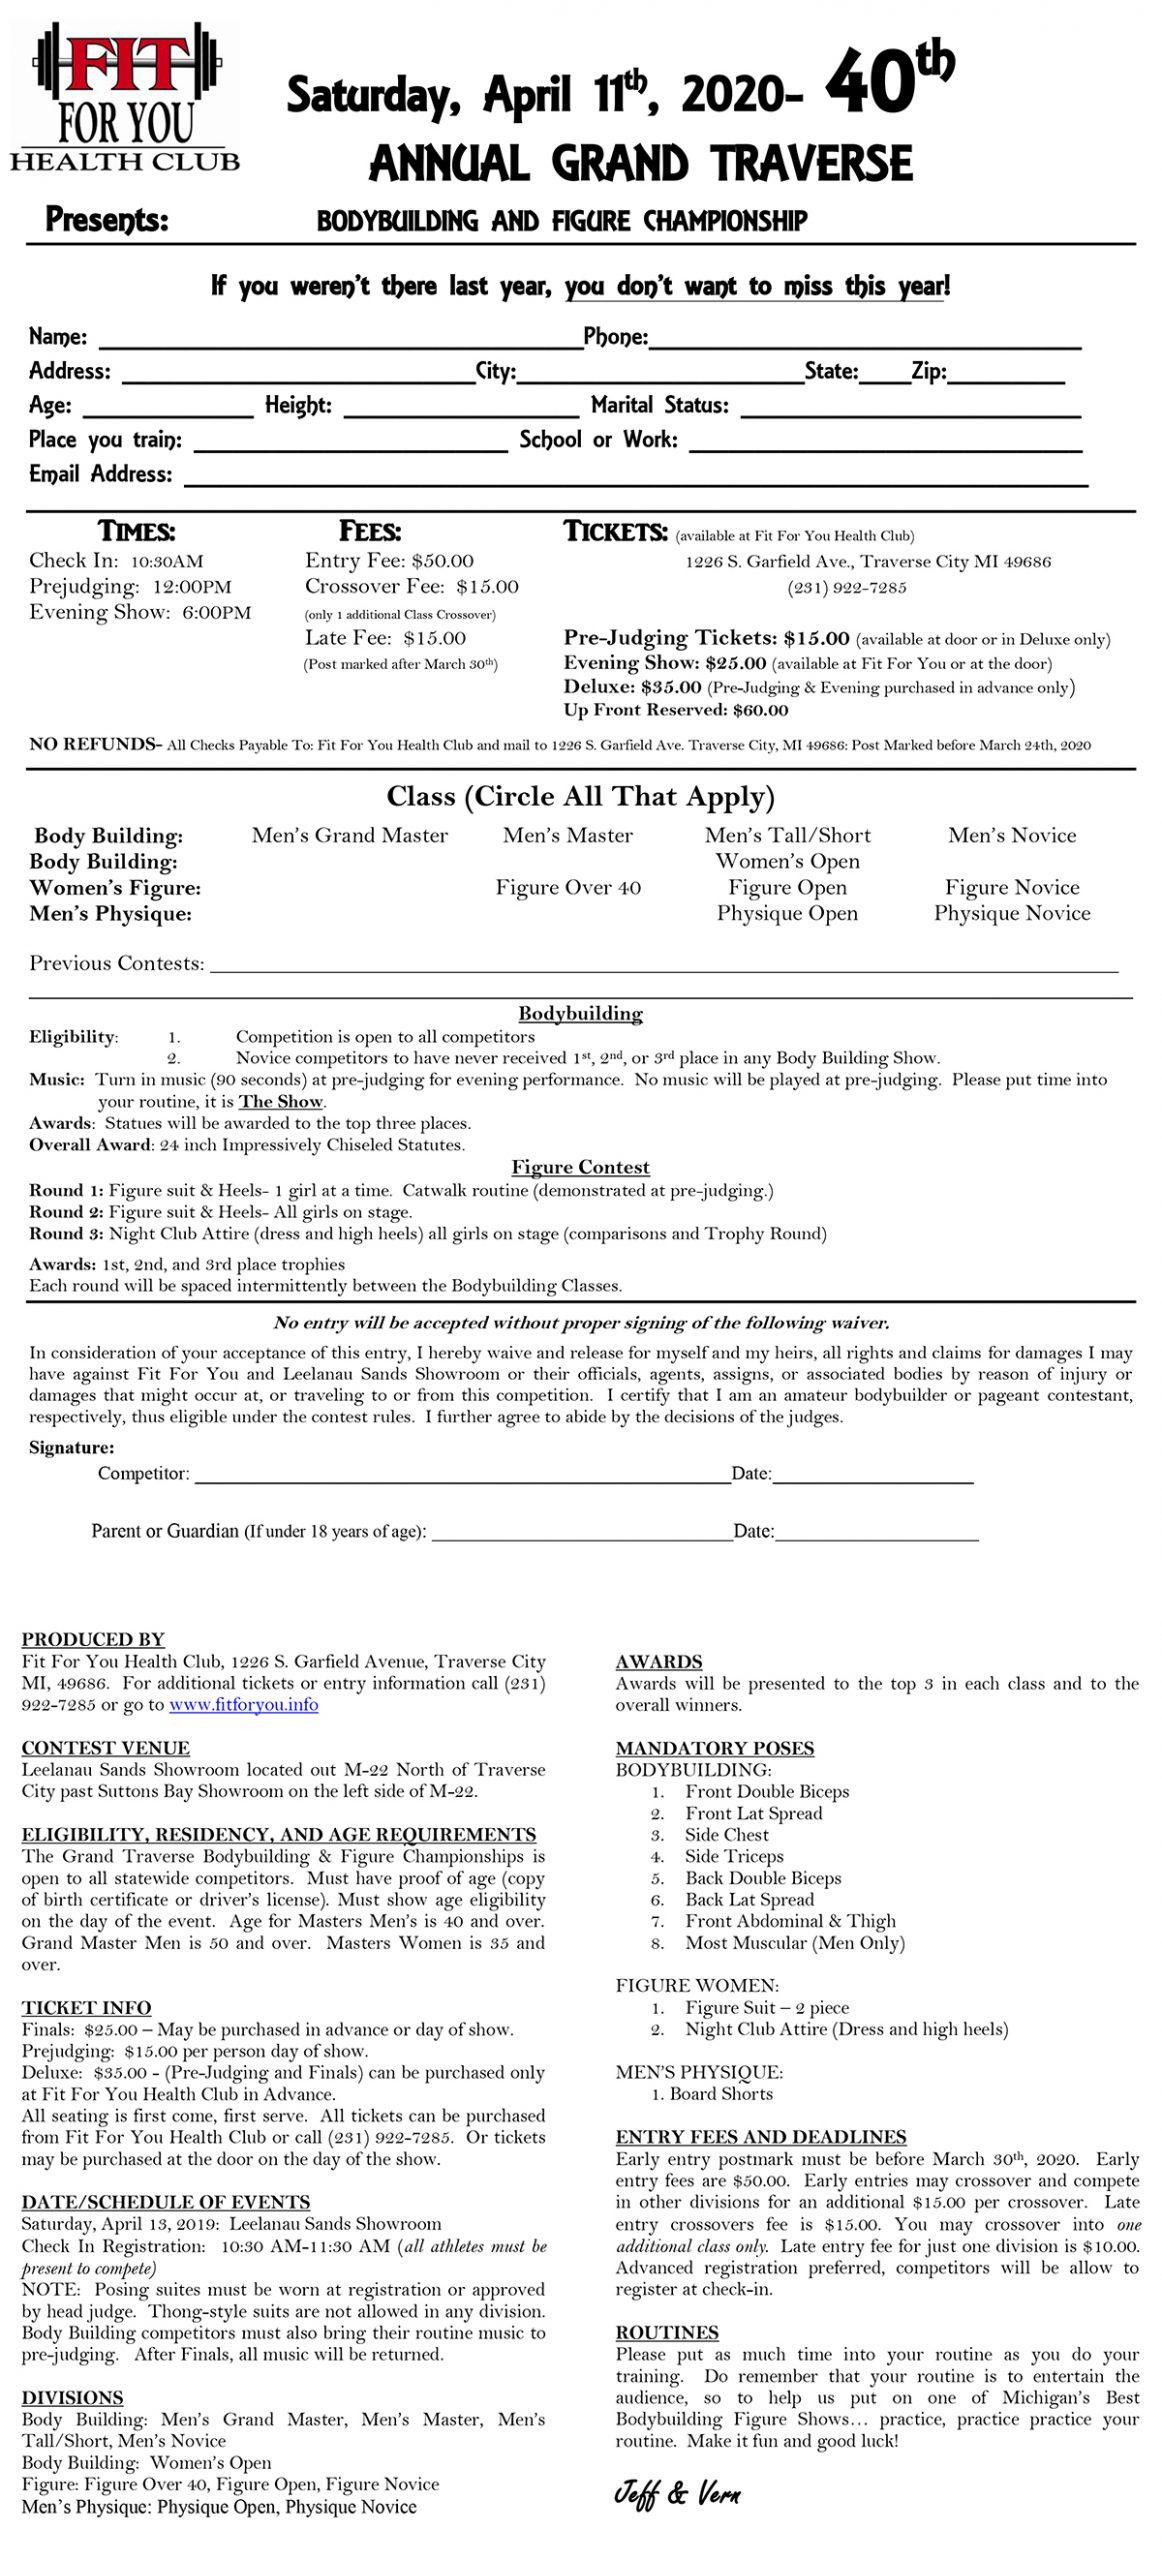 2020 Grand Traverse Bodybuilding & Figure Championship Registration Form